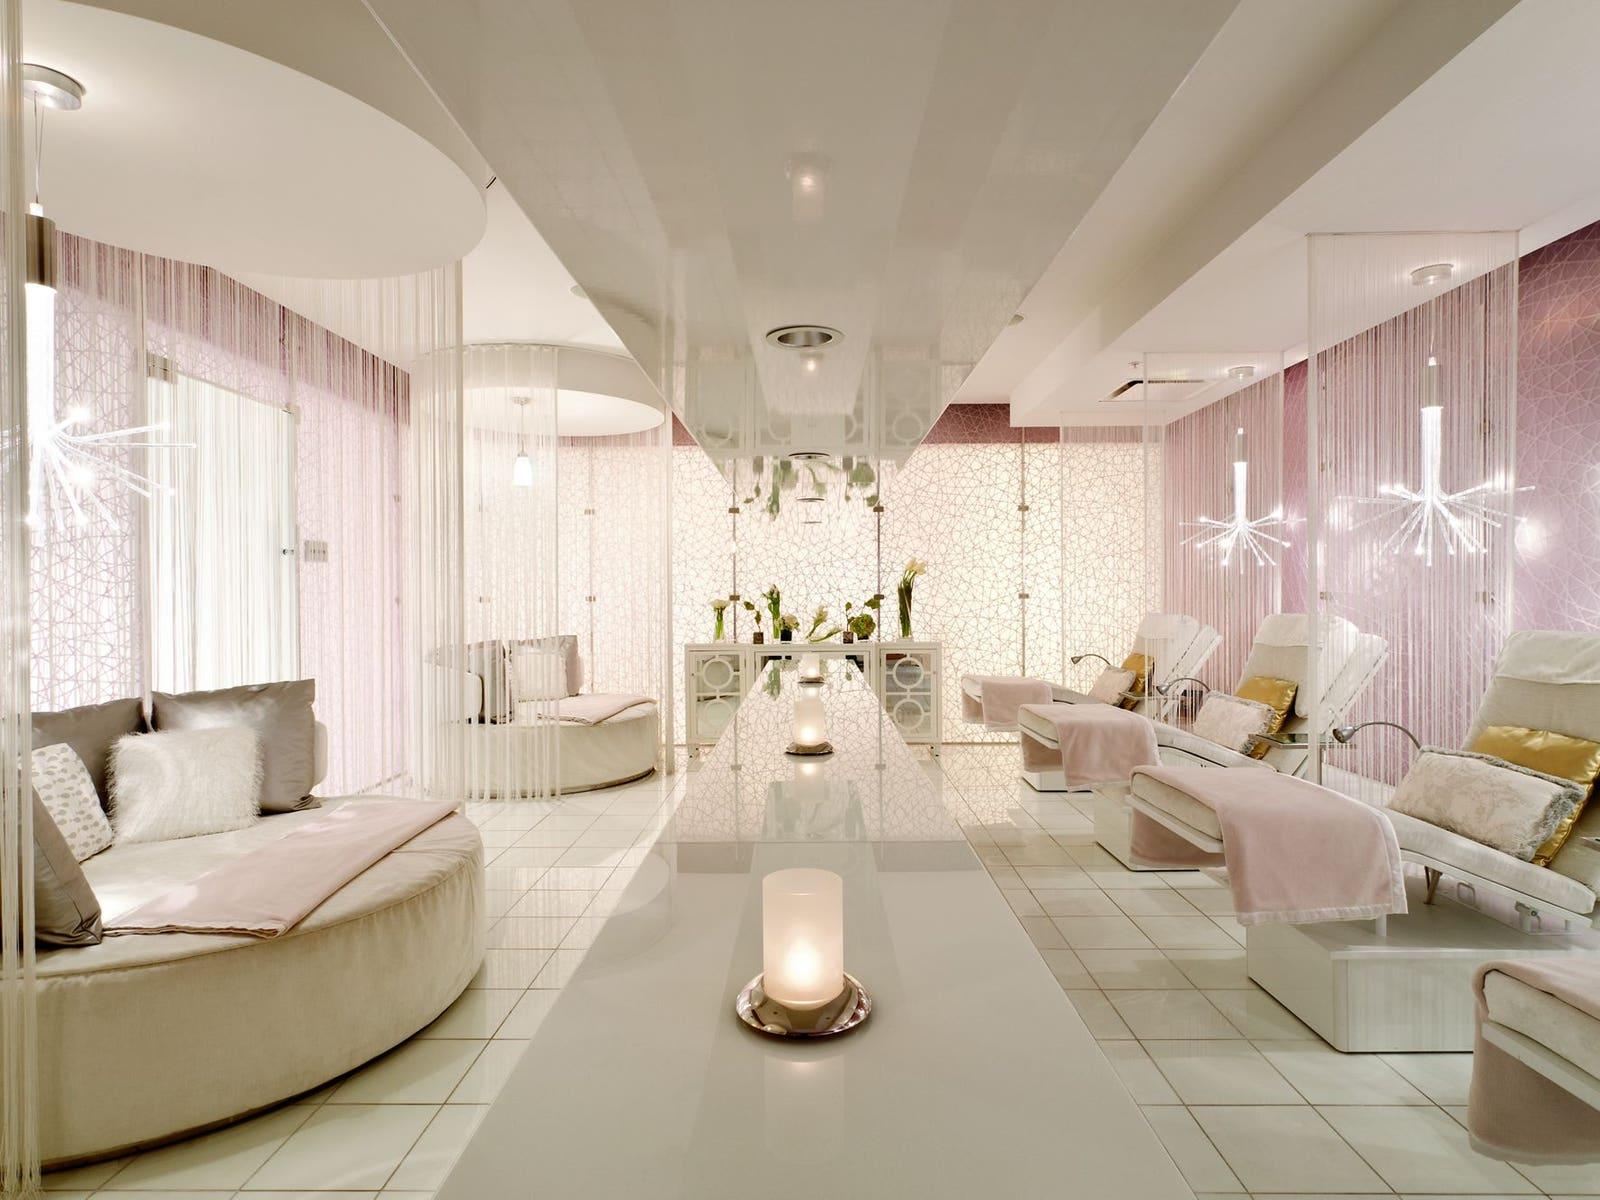 The Ritz-Carlton, Los Angeles Spa